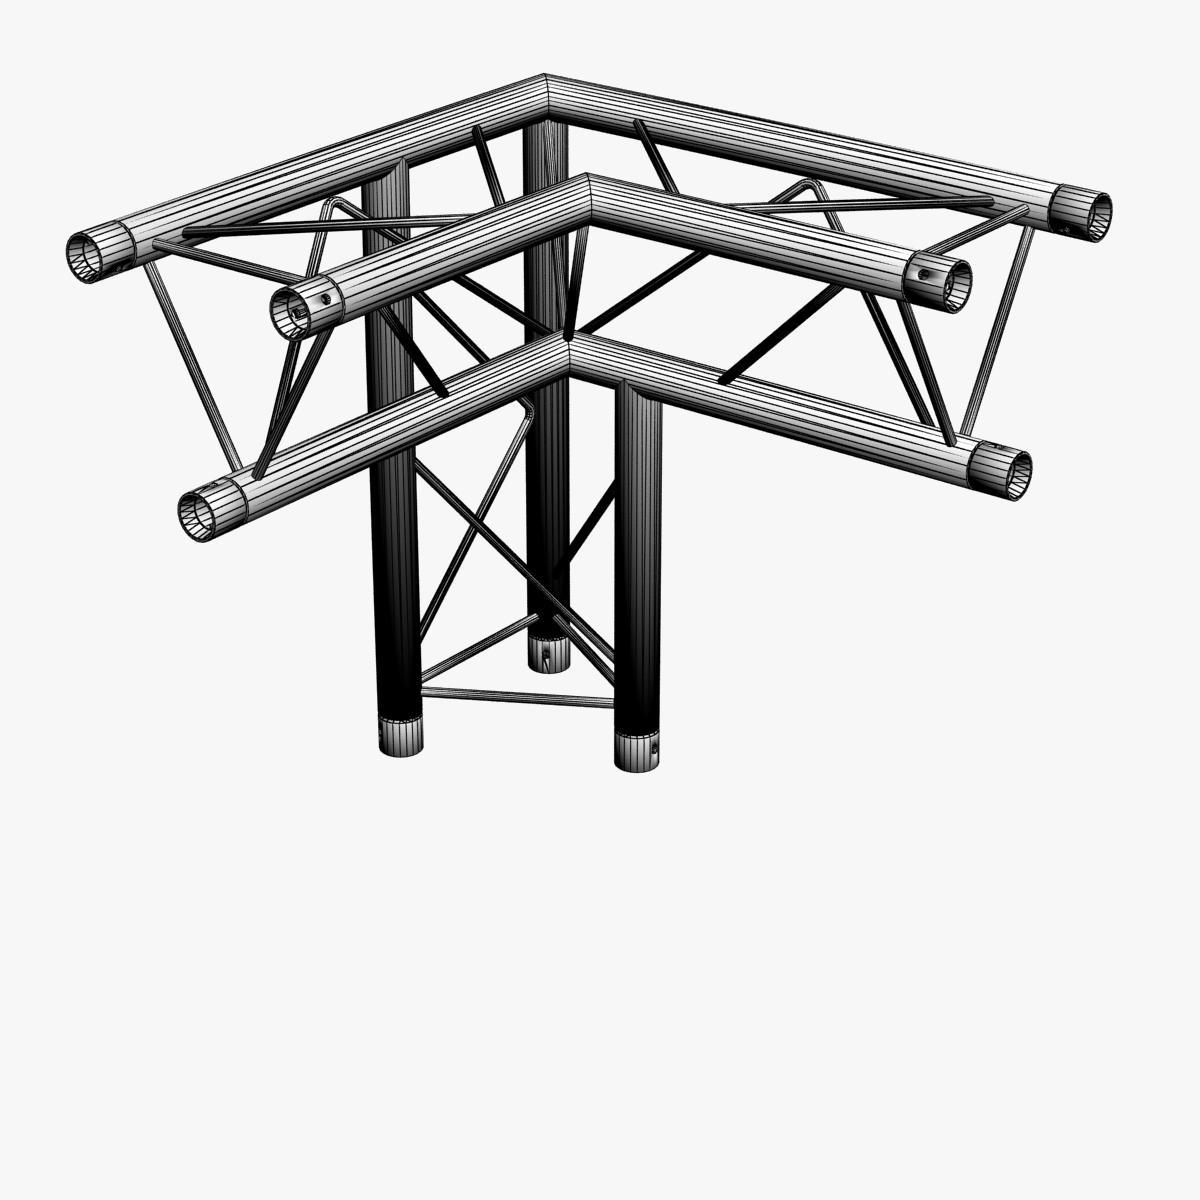 triangular trusses (collection 55 modular pieces) 3d model 3ds max dxf fbx c4d dae texture obj 216265